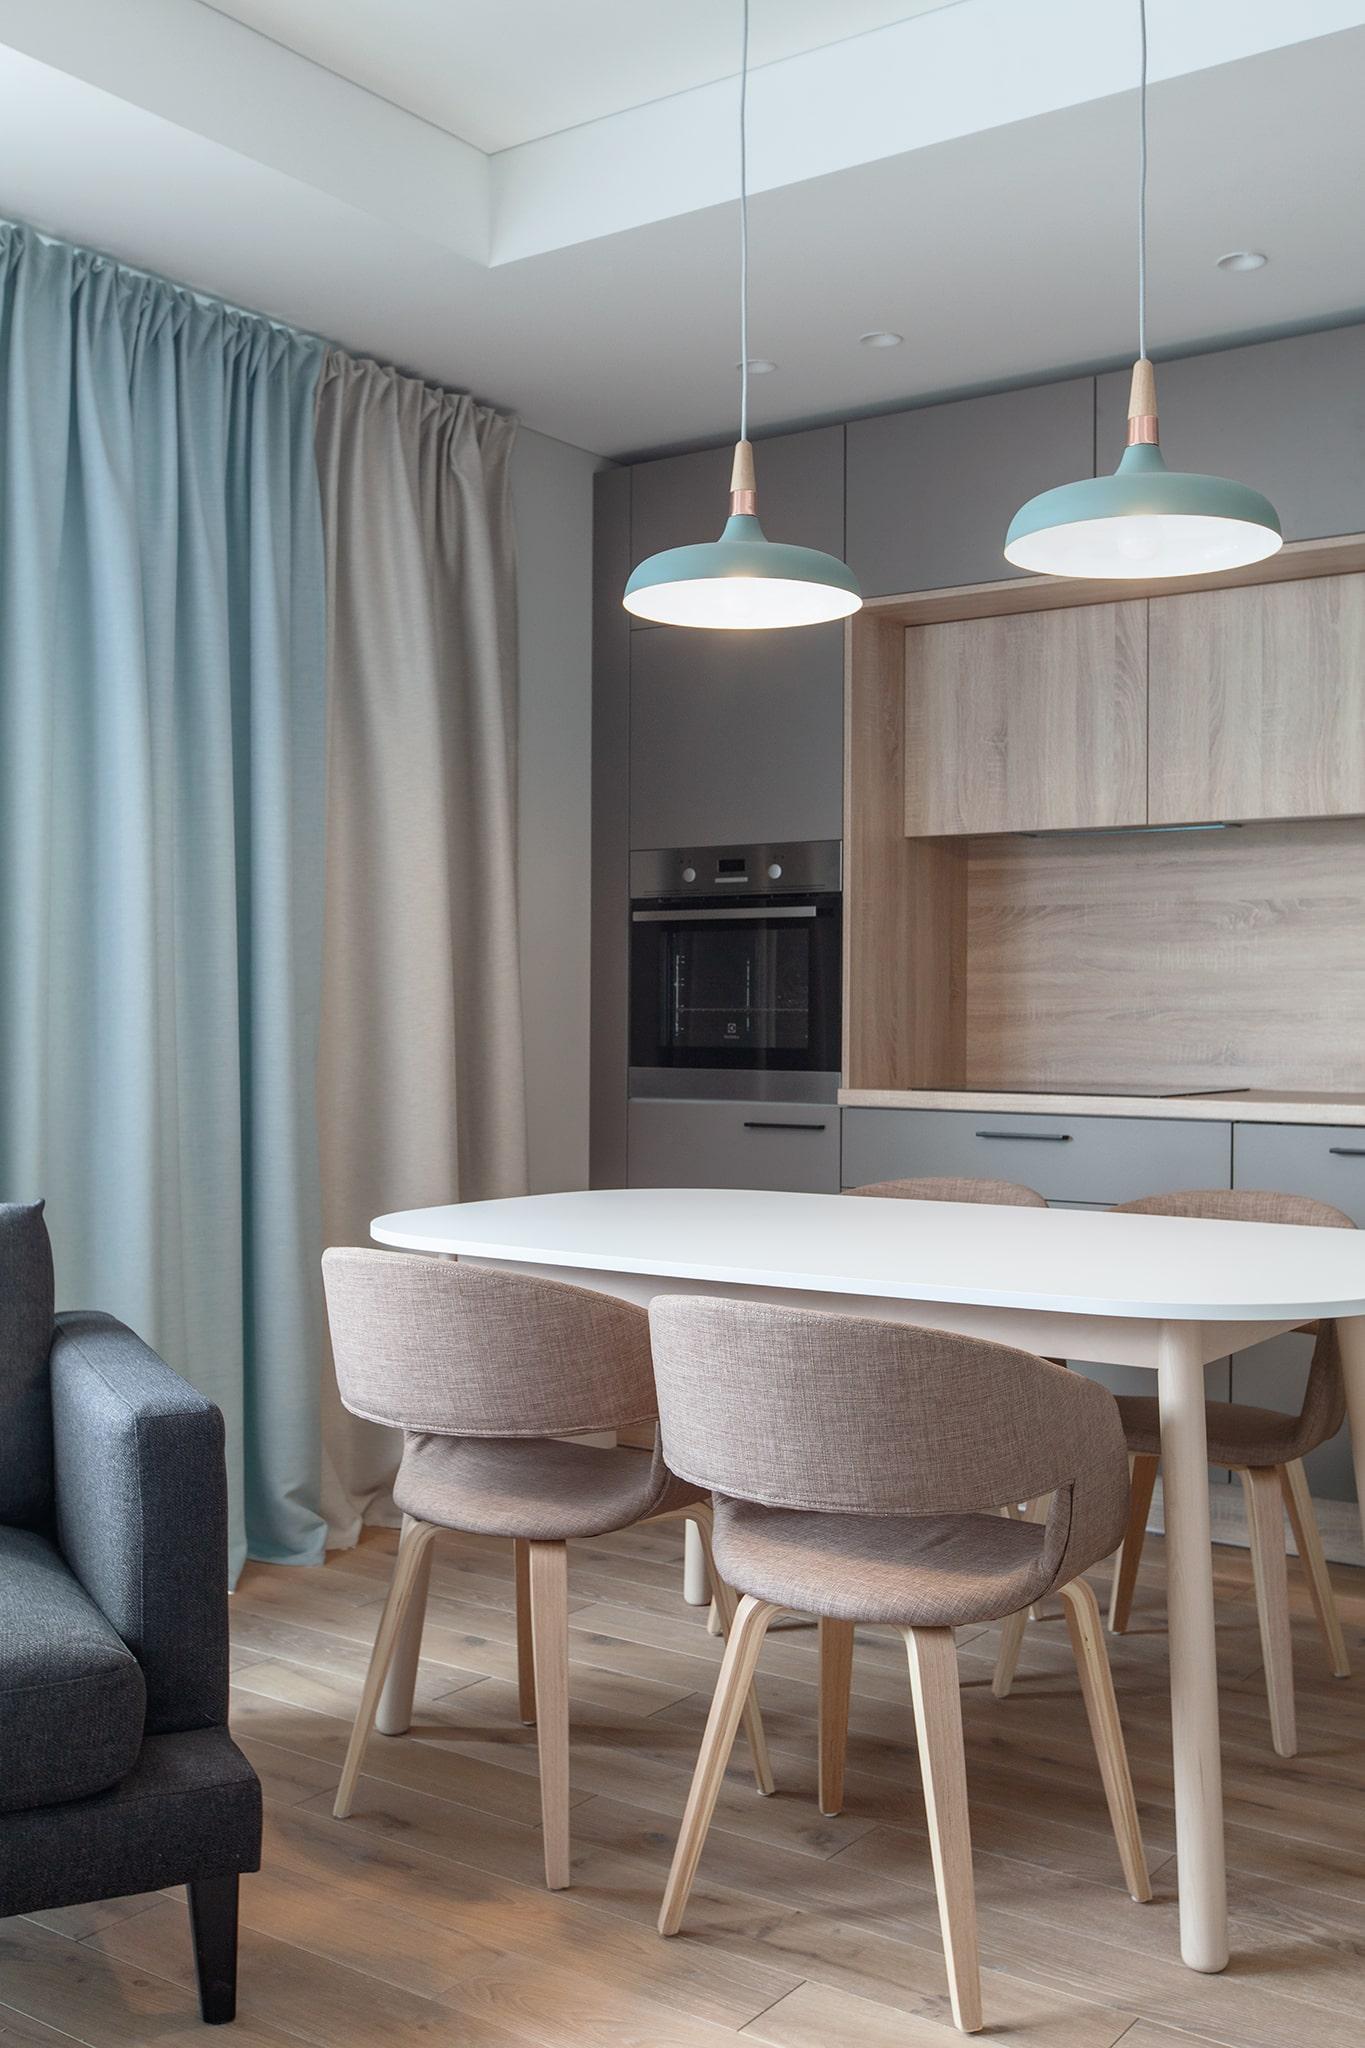 Kartu įrengta ir virtuvės erdvė